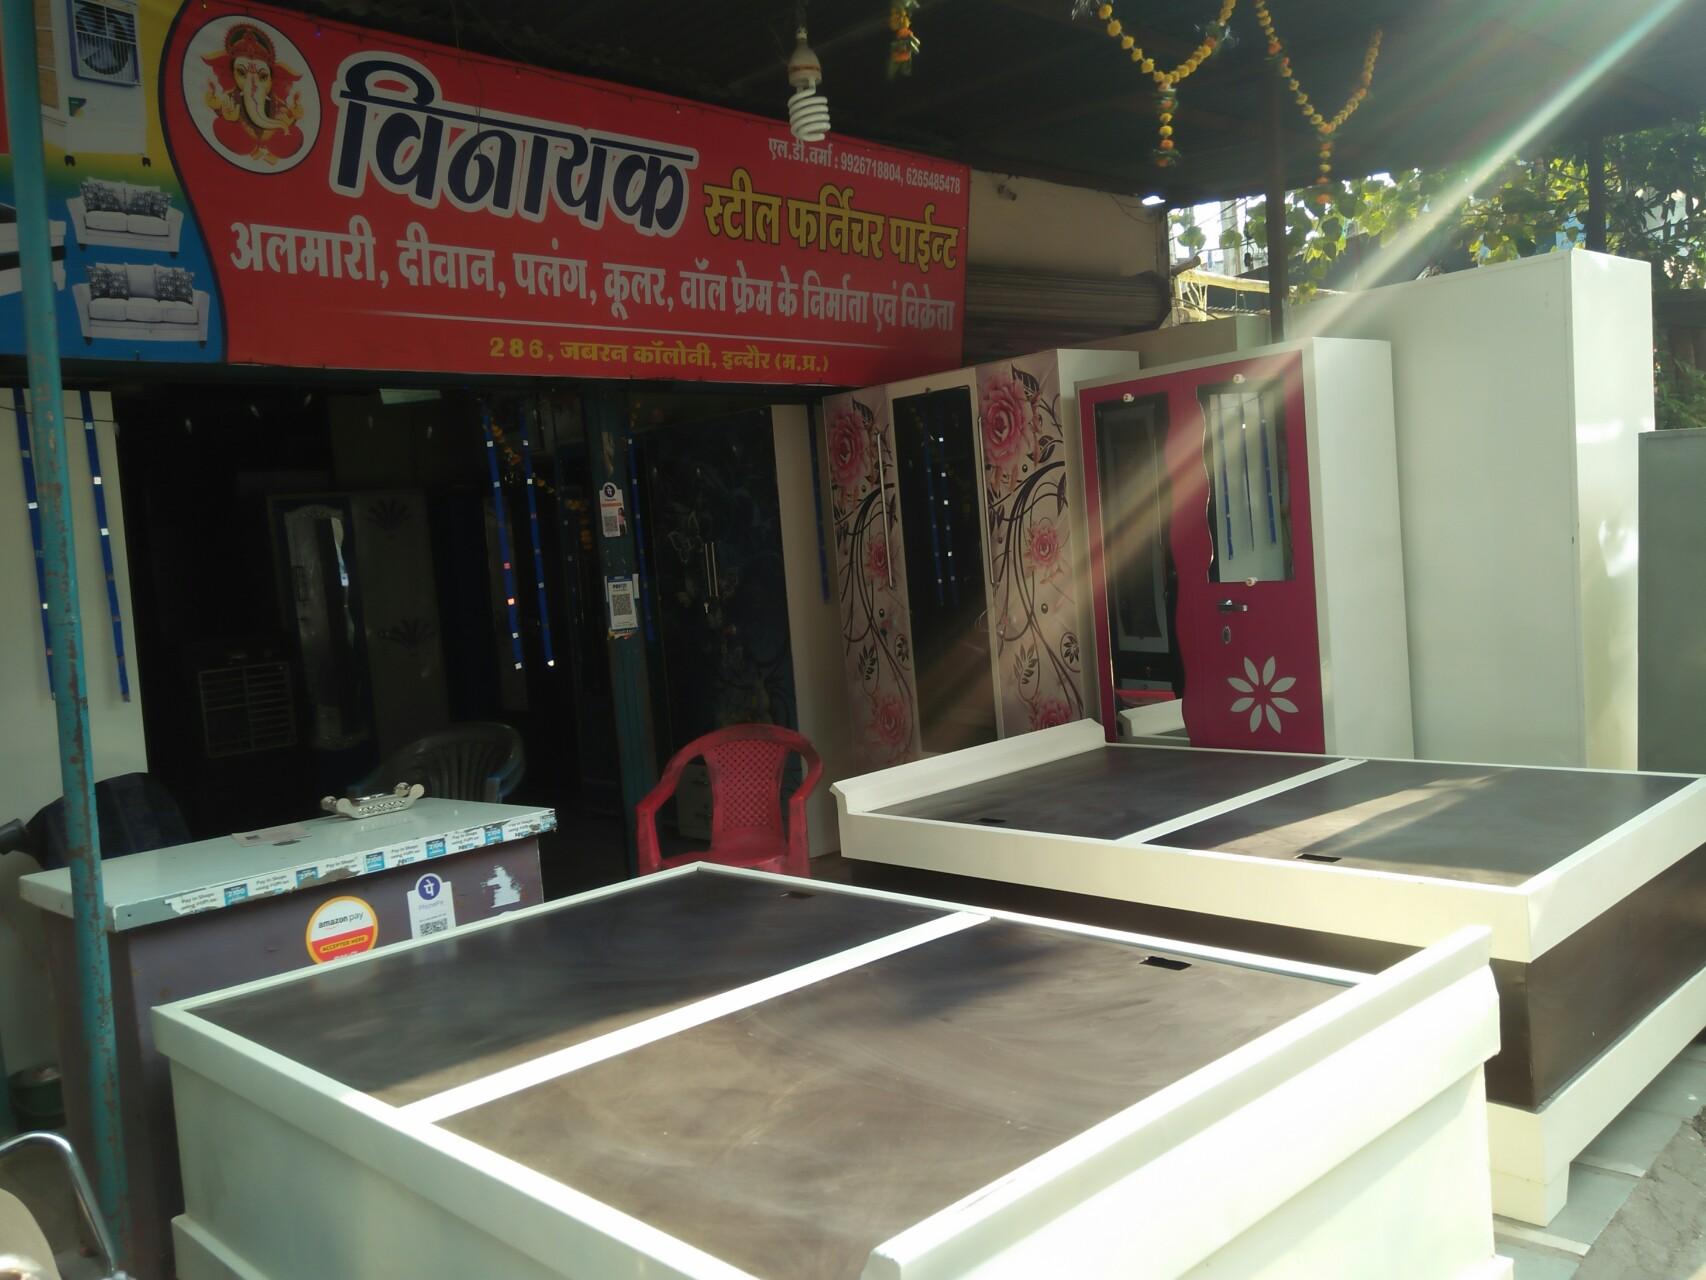 Vinayak steel furniture point